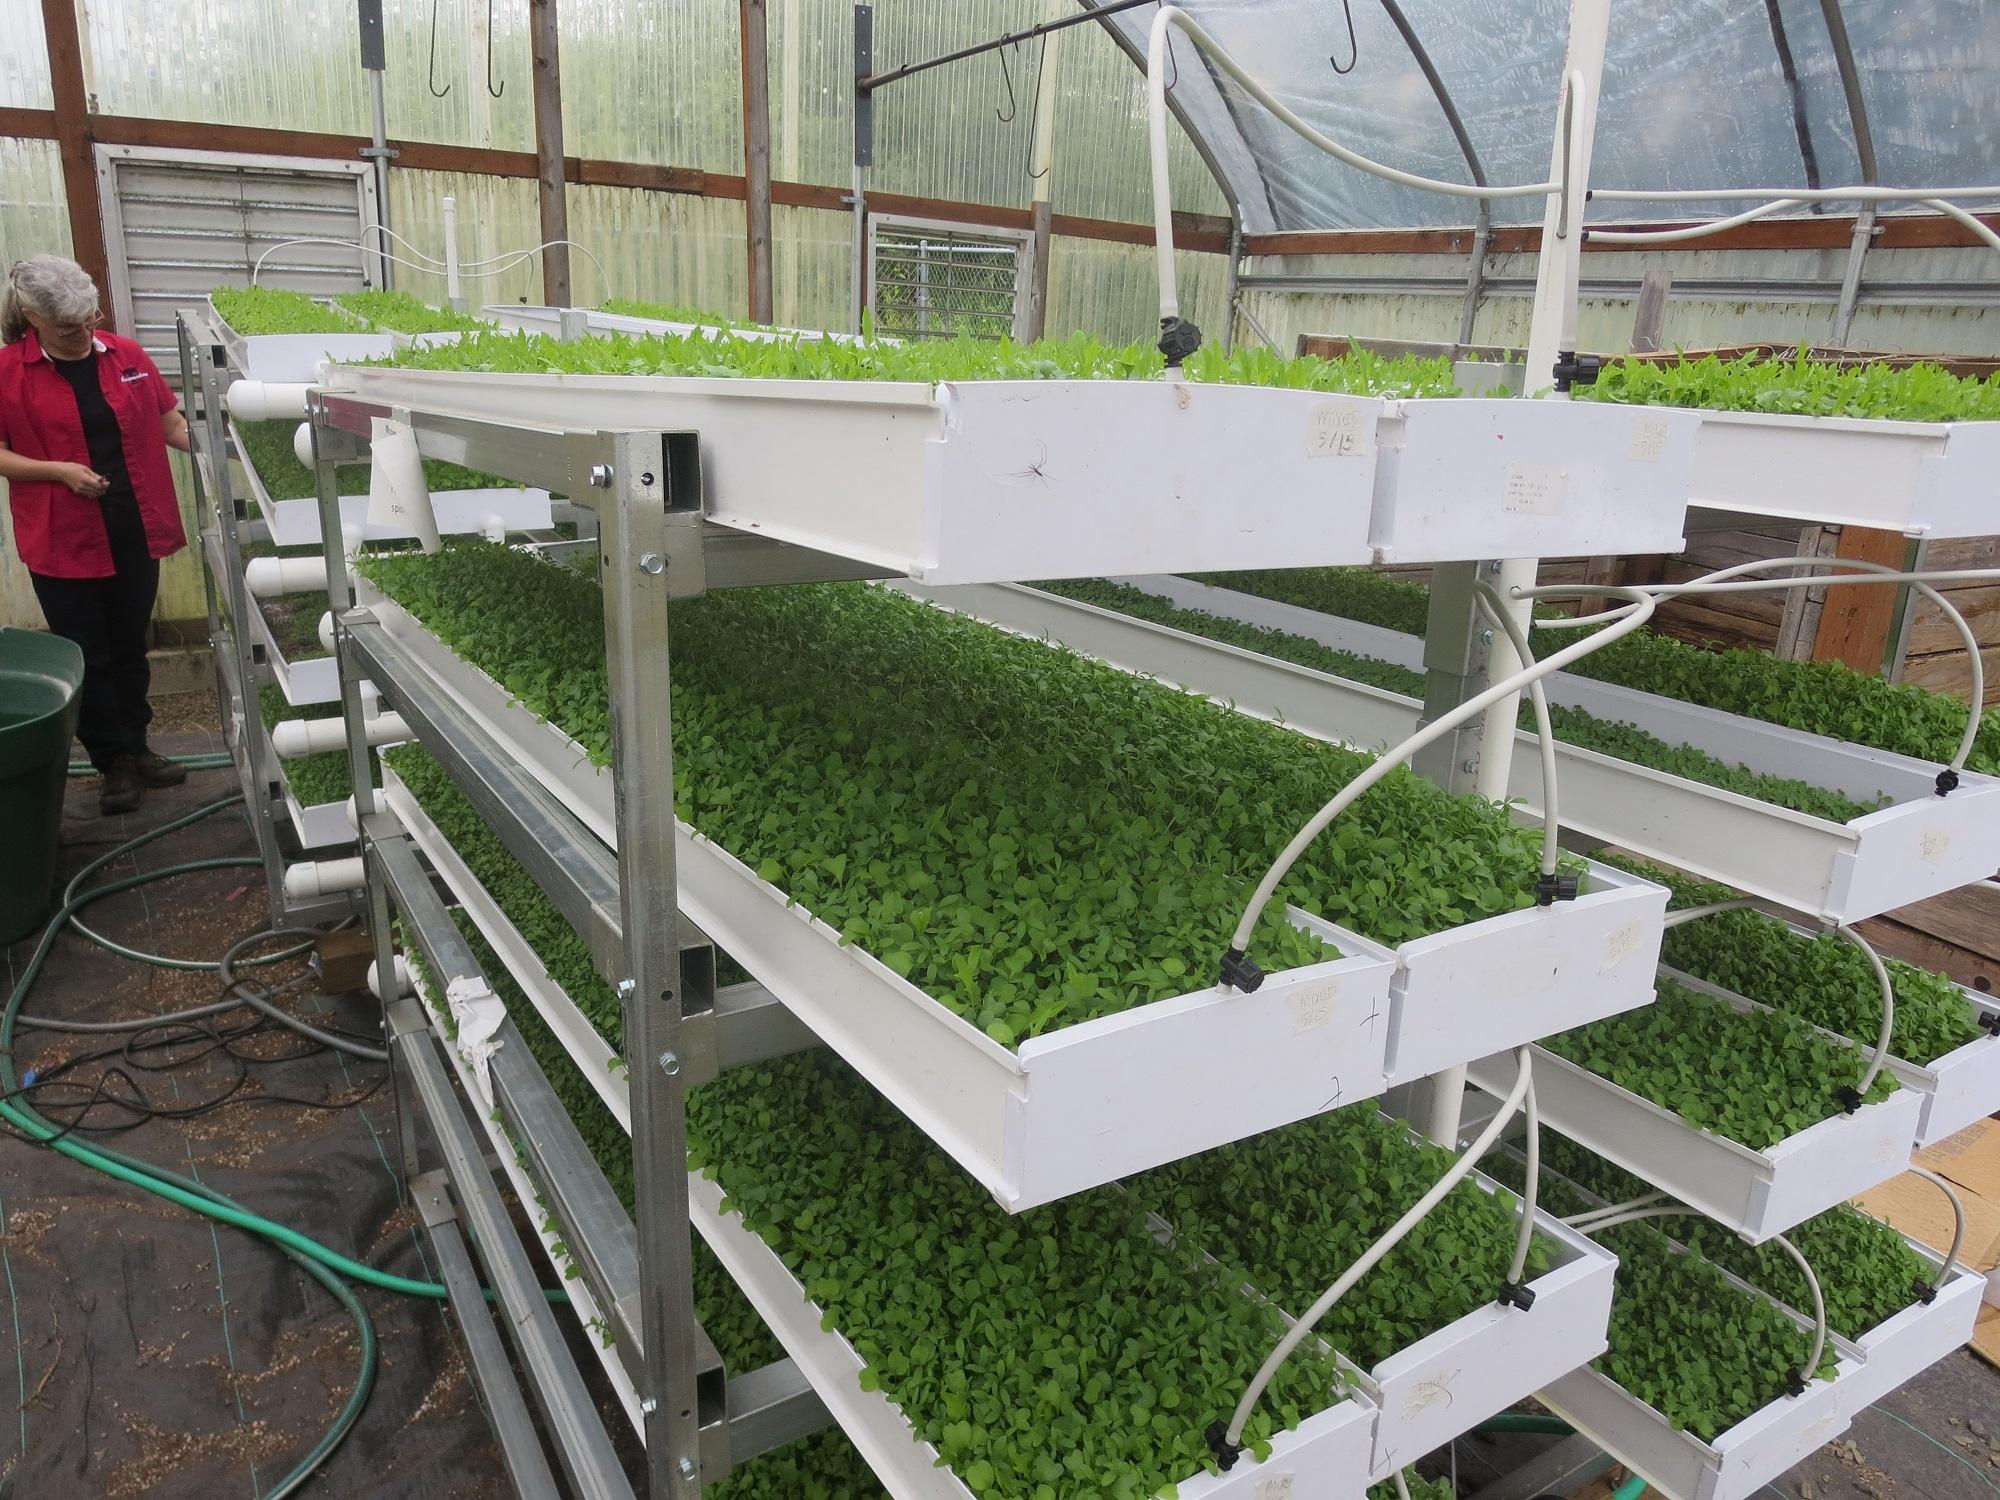 Producing Microgreens at Tillamook High School | Growers ...